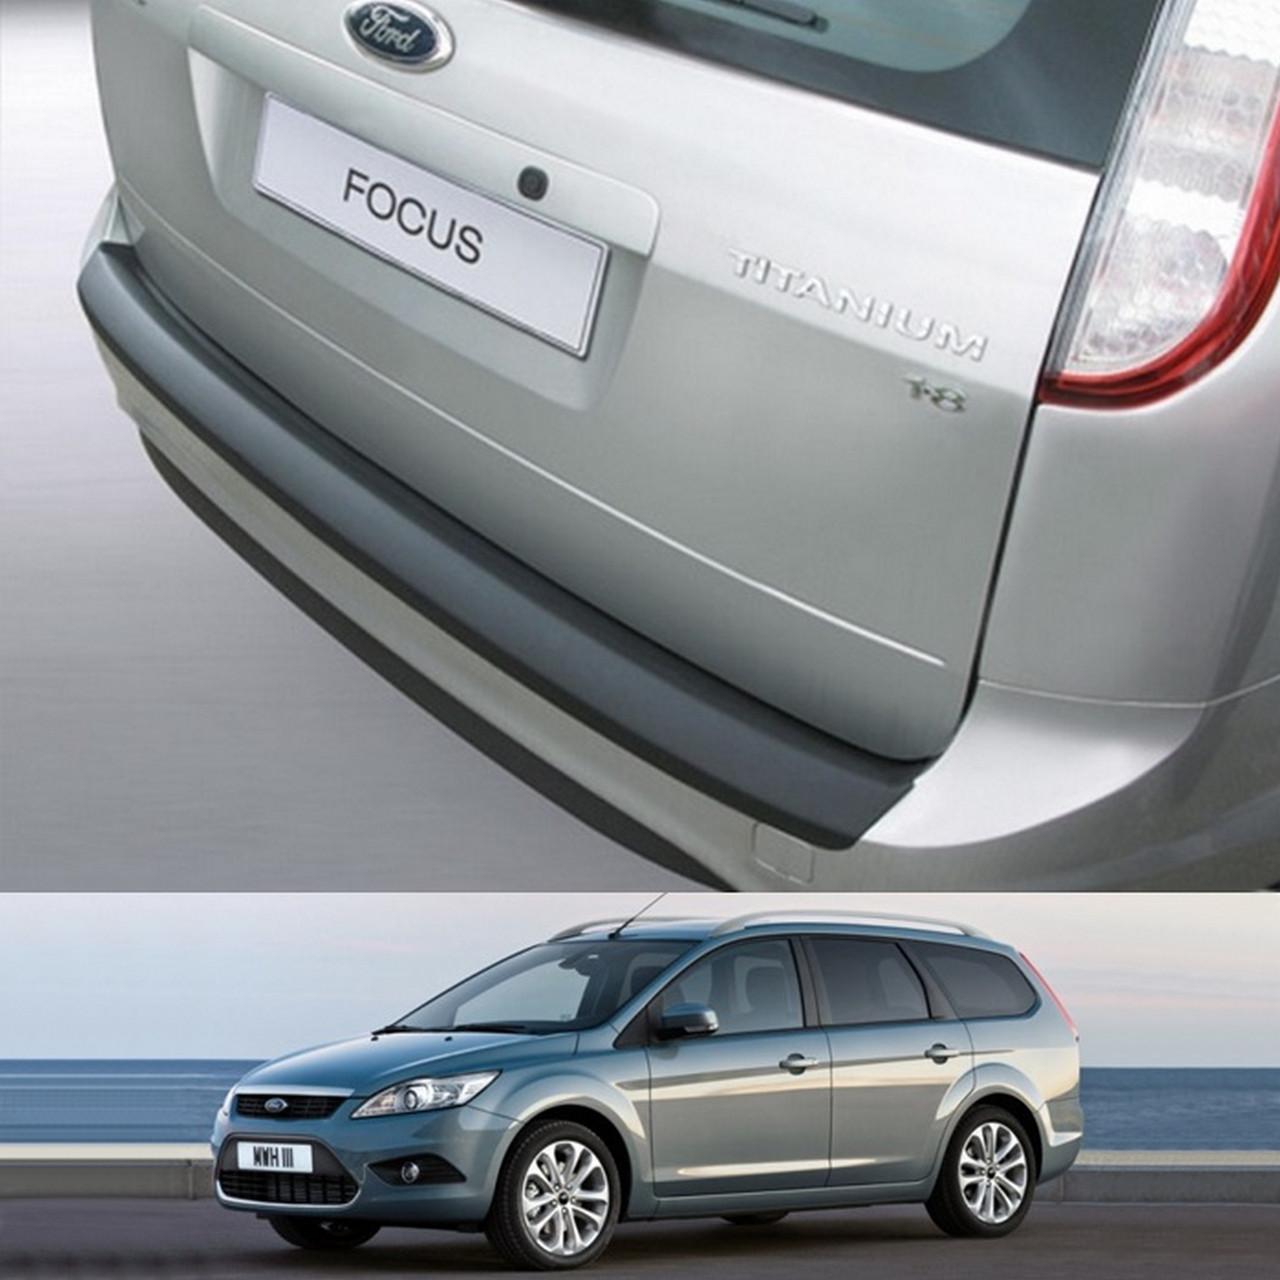 Ford Focus Turnier 2007-2011 пластиковая накладка заднего бампера